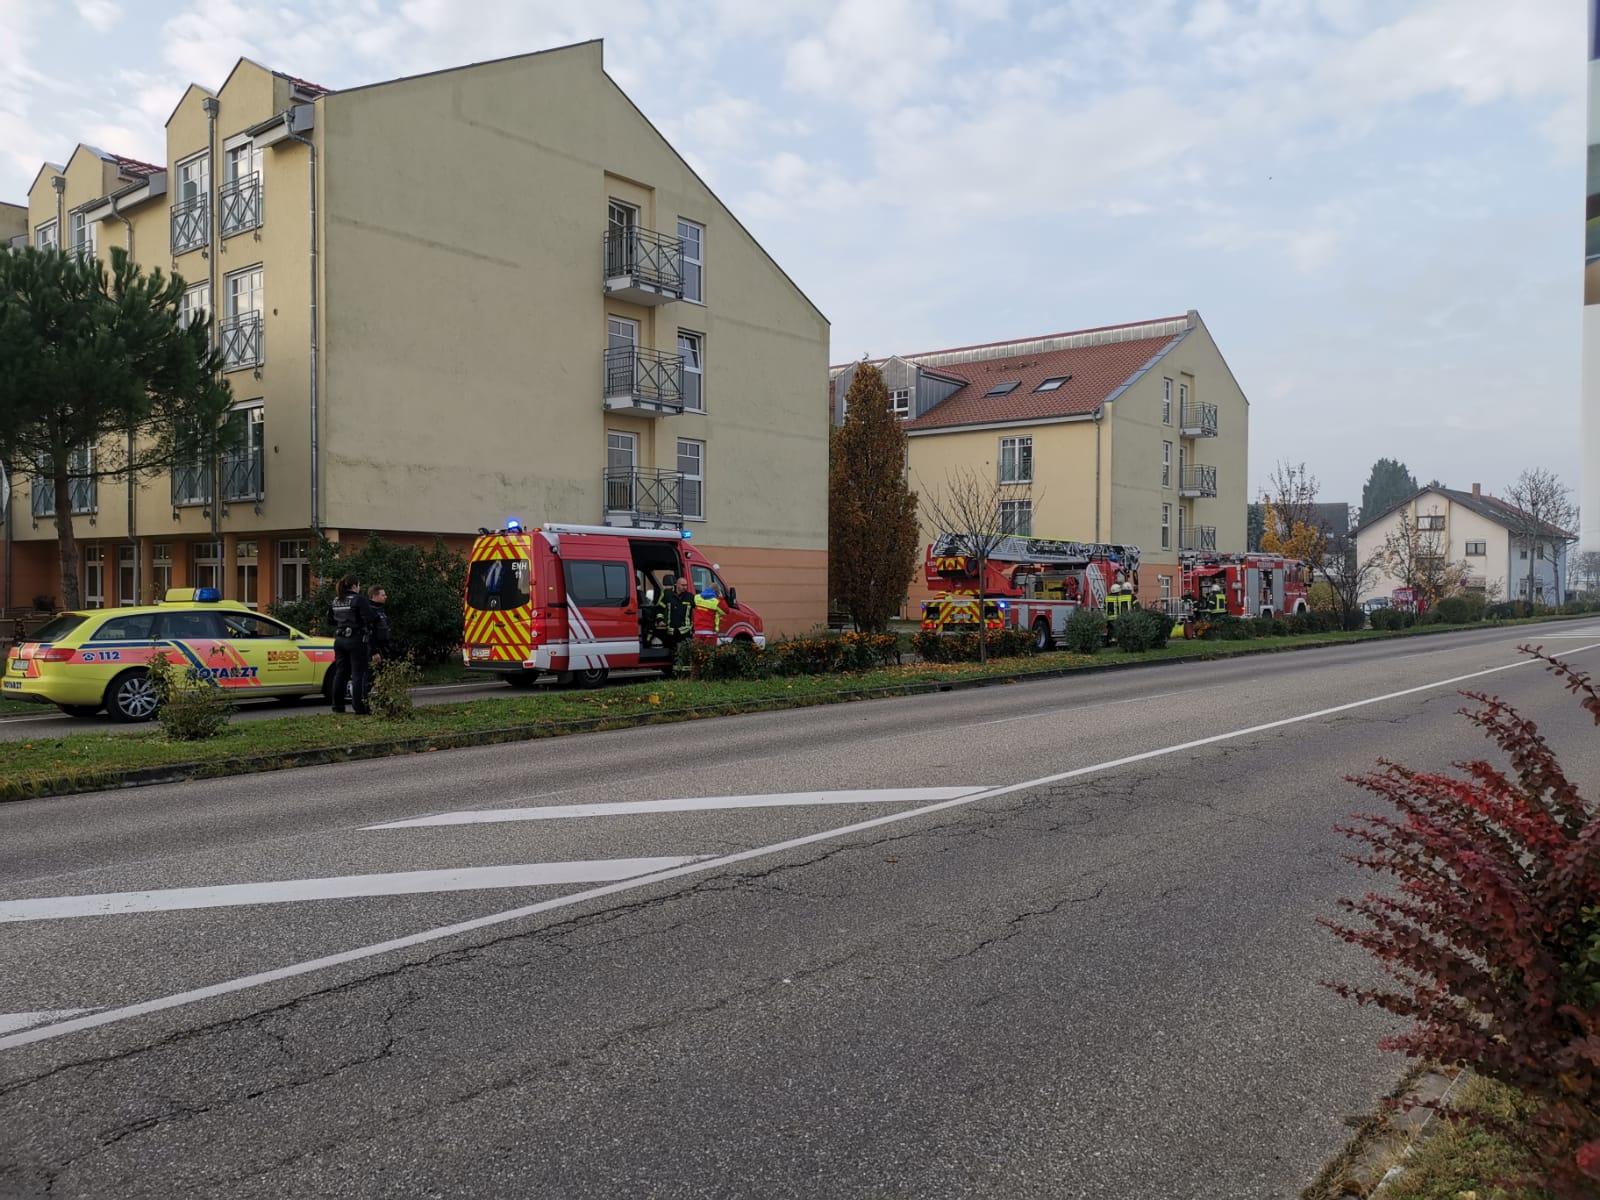 AH Avendi Neckarhausen